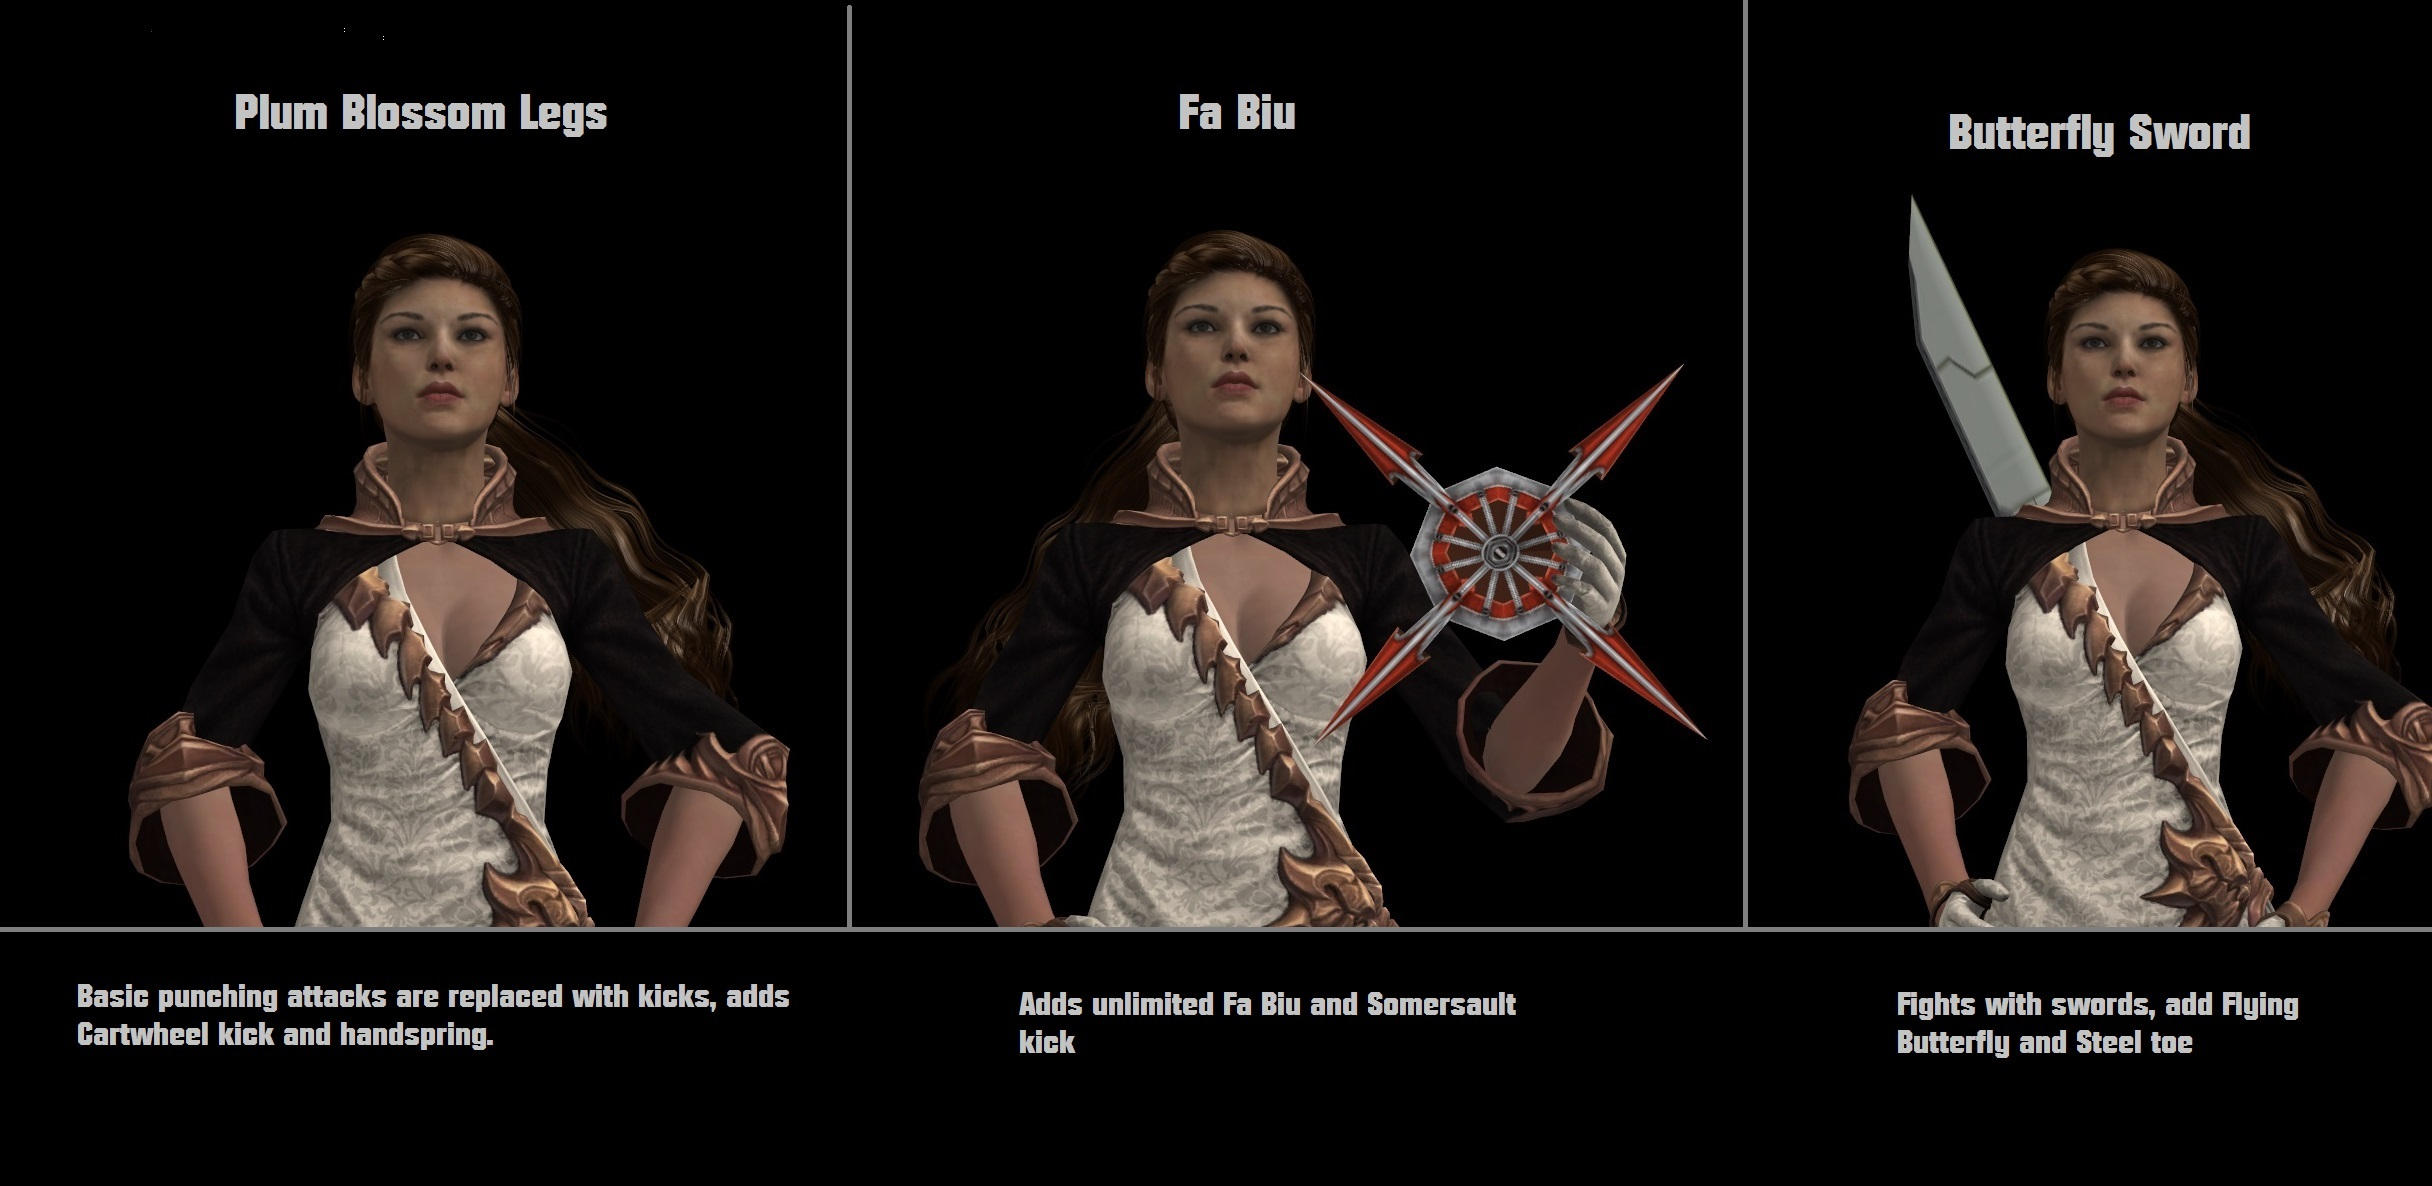 Mortal Kombat OC Madeline  Variations By Sierra53cx On DeviantArt